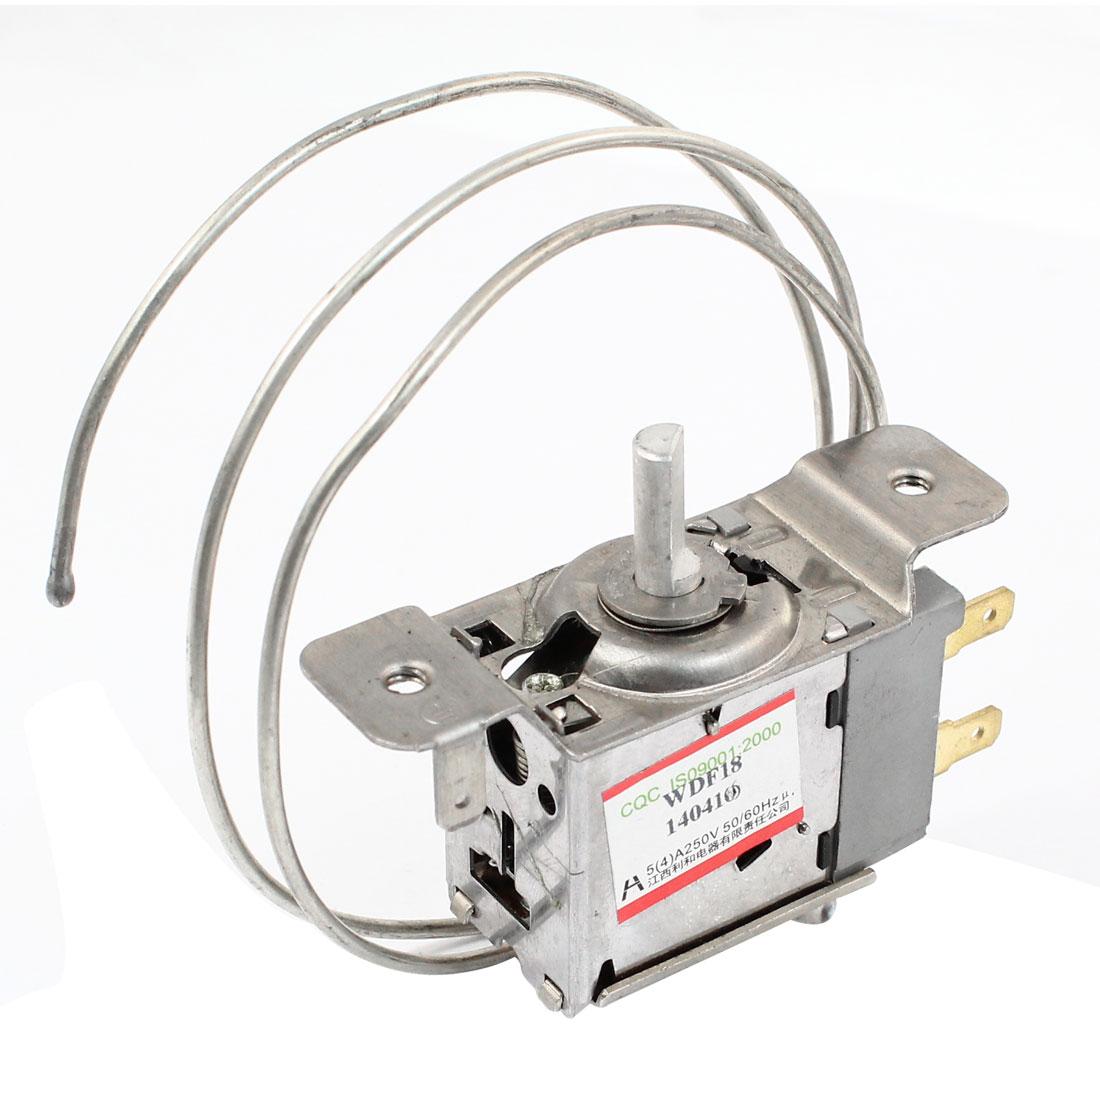 WDF18 3 Terminals Refrigerator Refrigeration Thermostat w 61cm Metal Cord